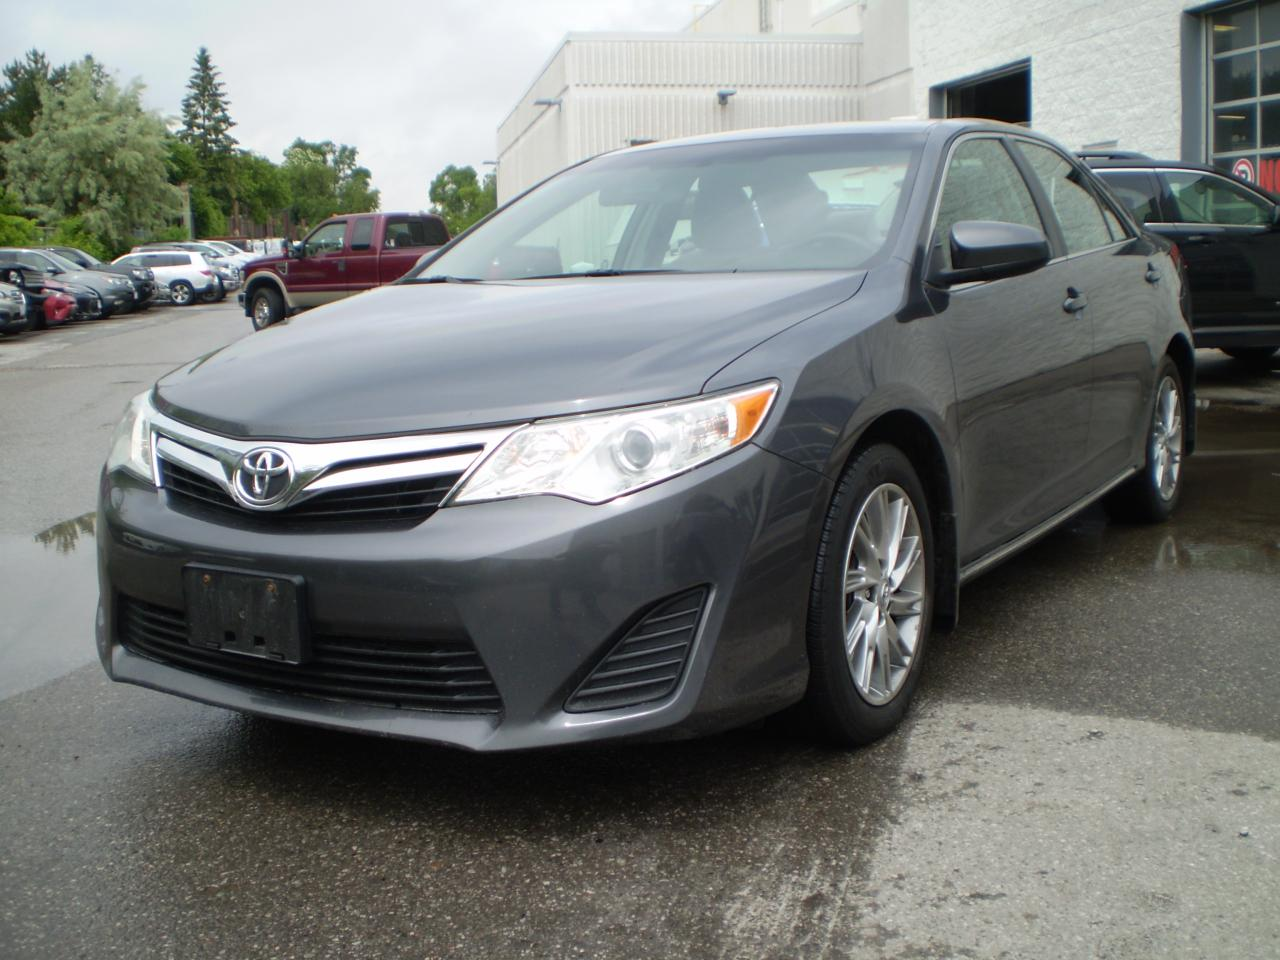 Photo of Gray 2012 Toyota Camry